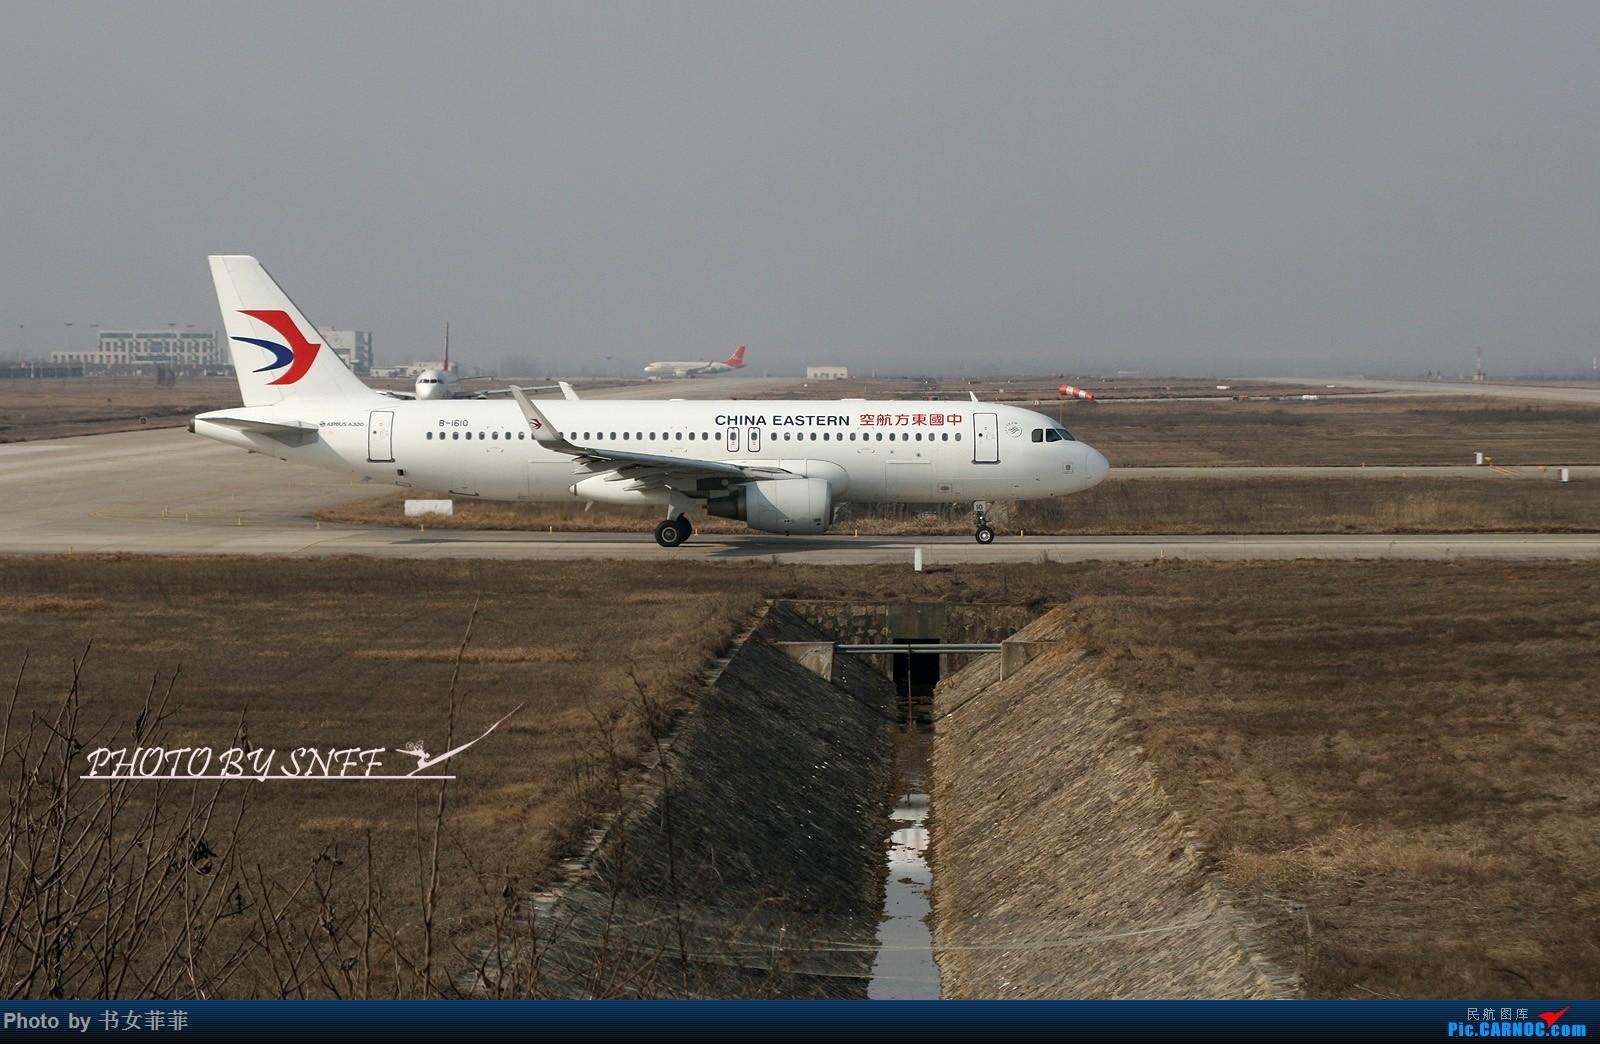 Re:【合肥飞友会·霸都打机队】2016-17年会拍机—第一次新桥拍飞机就有大飞机 AIRBUS A320-200 B-1610 合肥新桥国际机场